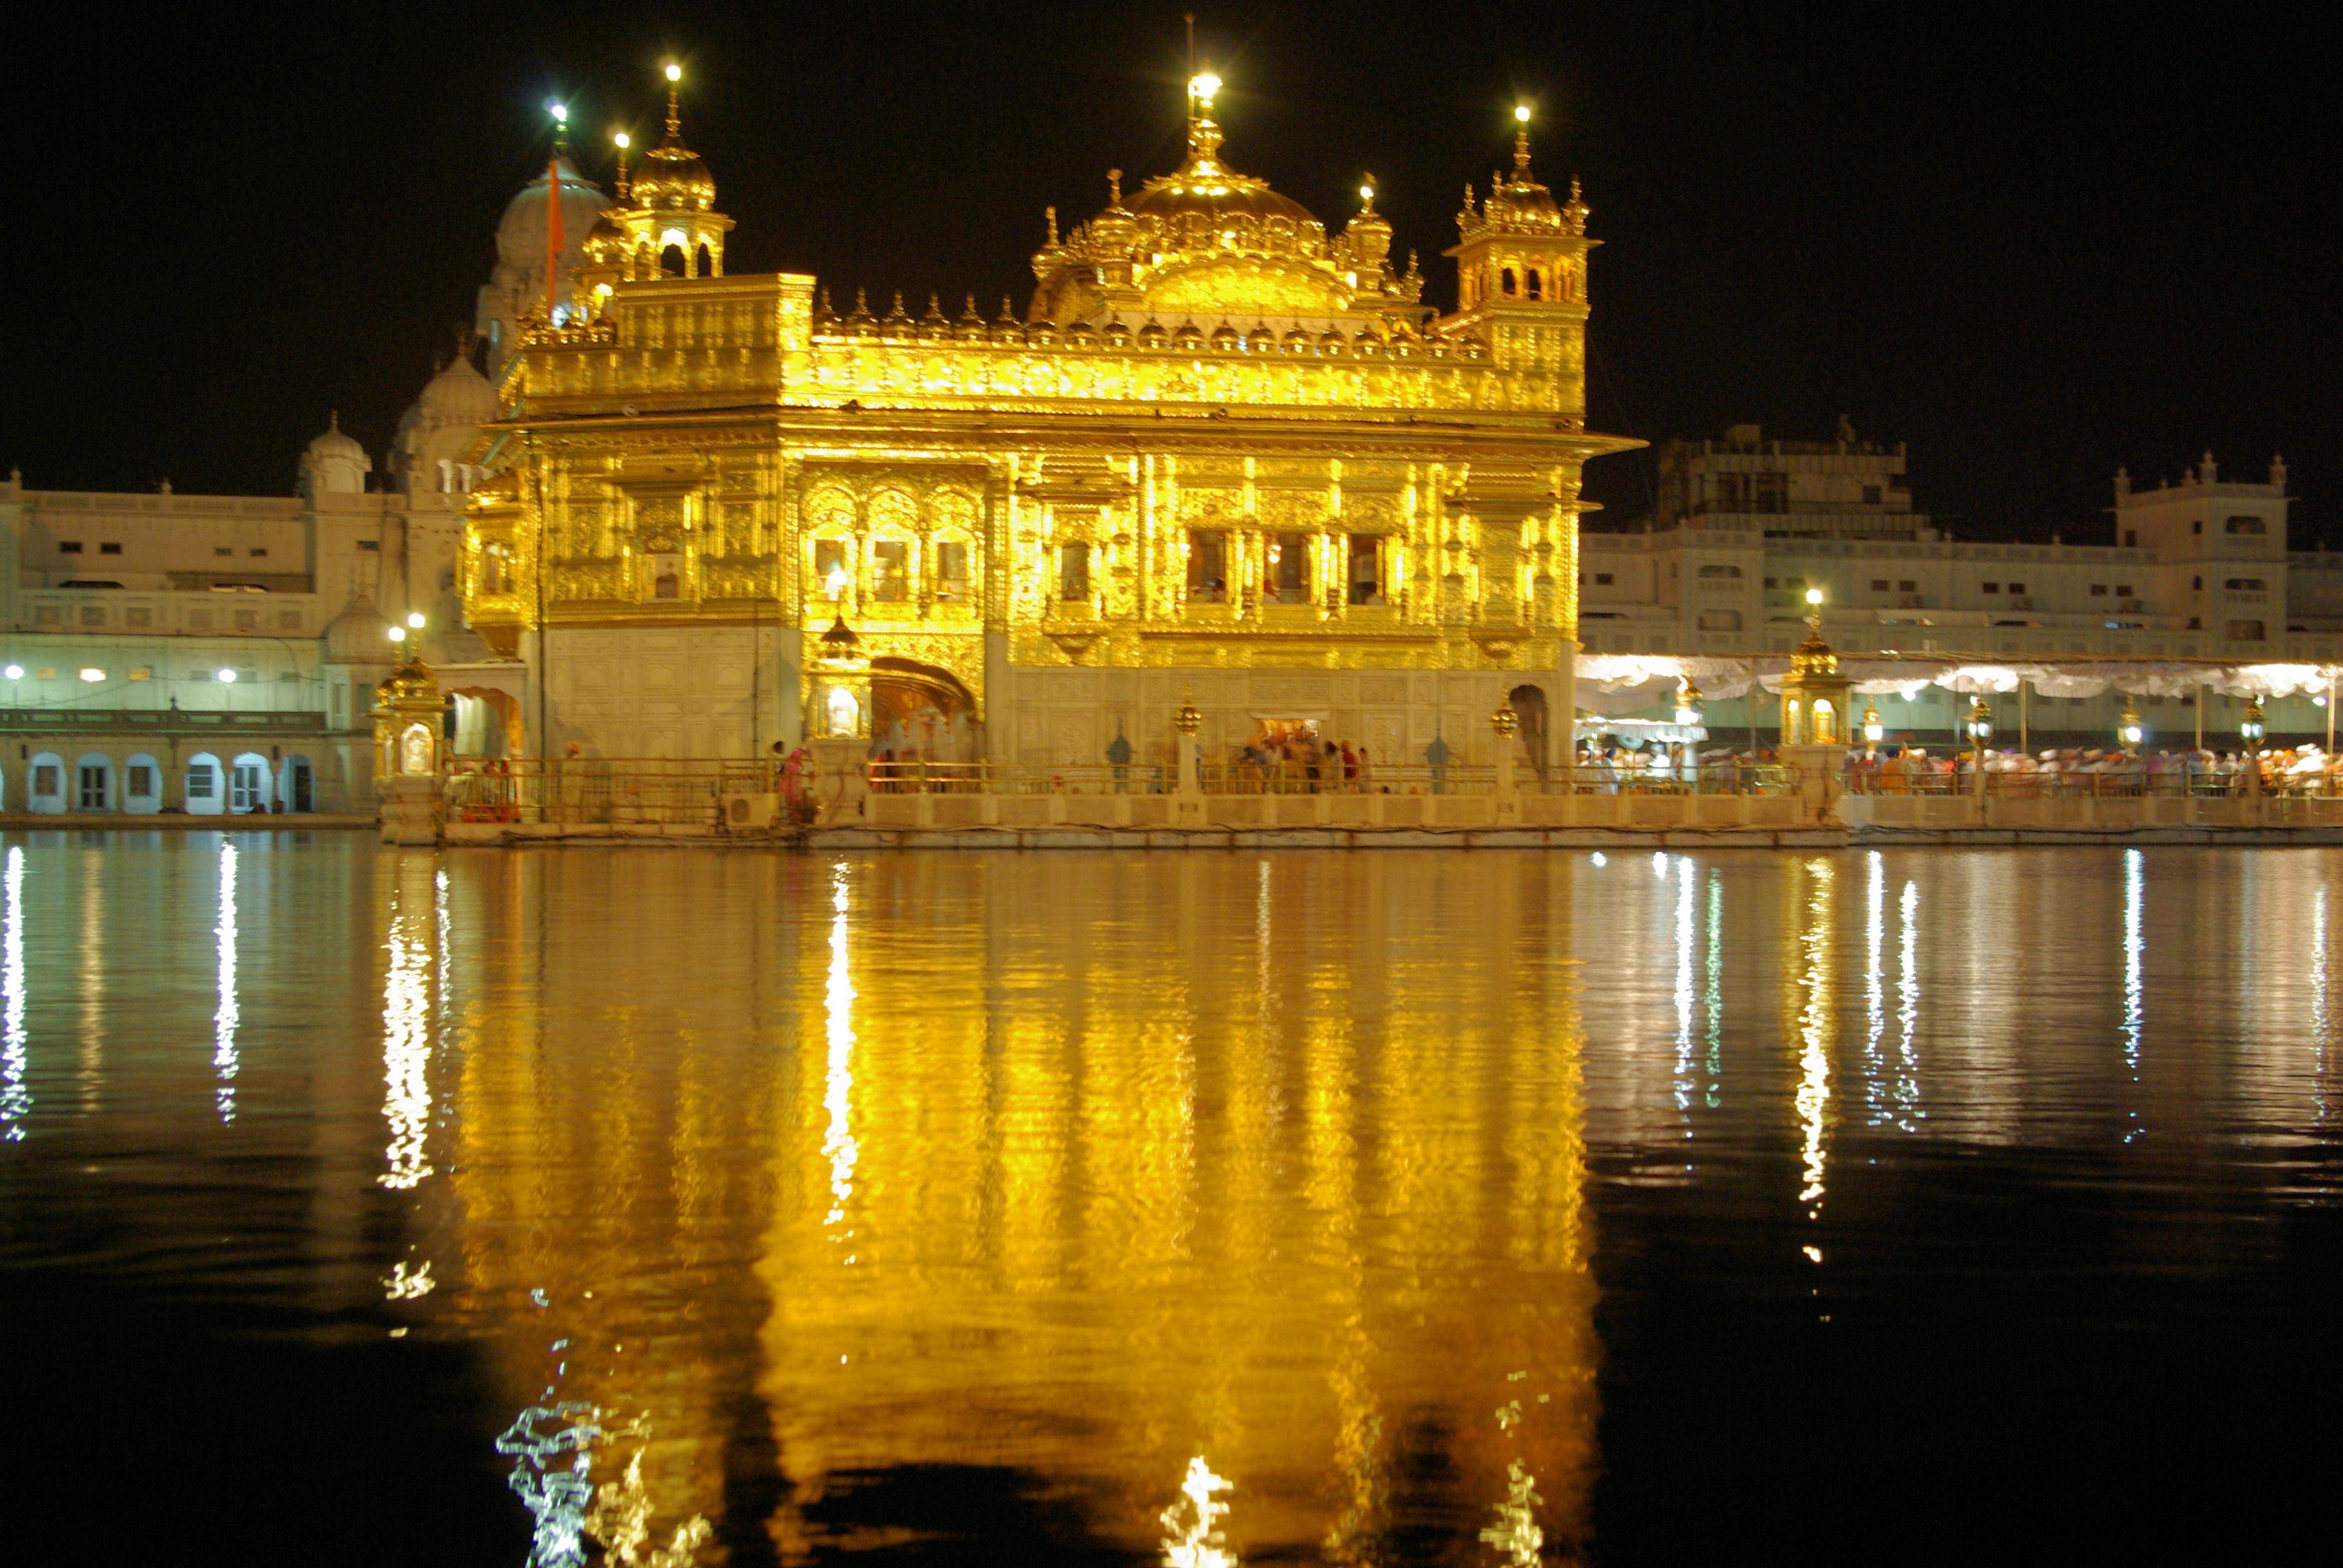 The Golden Temple Amritsar Golden Temple Golden Temple Amritsar Amritsar Golden temple wallpaper hd full size